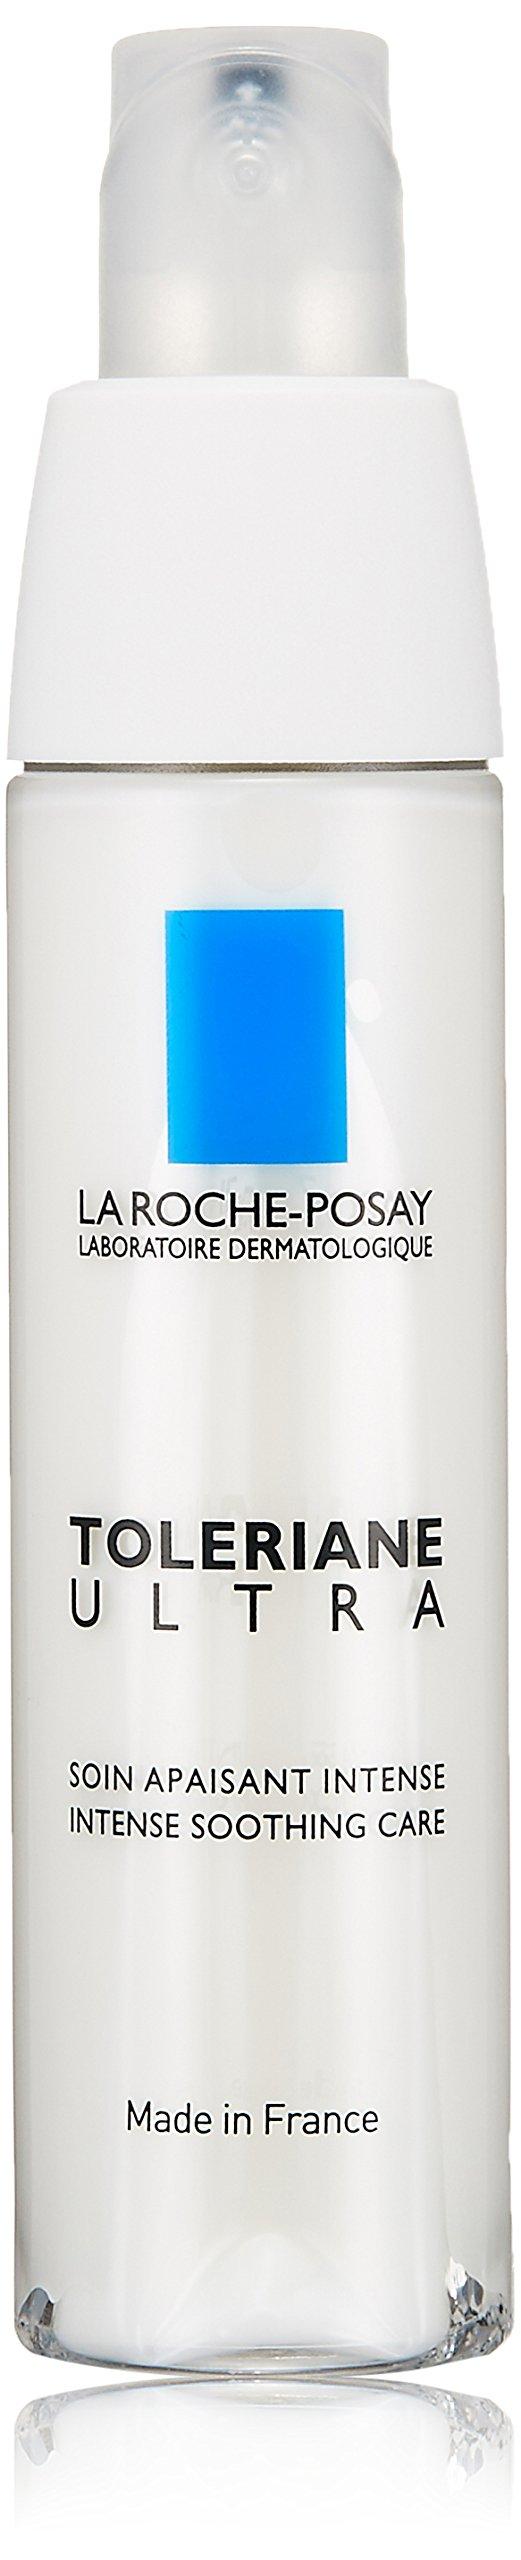 La Roche-Posay Toleriane Ultra Intense Soothing Facial Moisturizer for Sensitive Skin, 1.35 Fl. Oz.